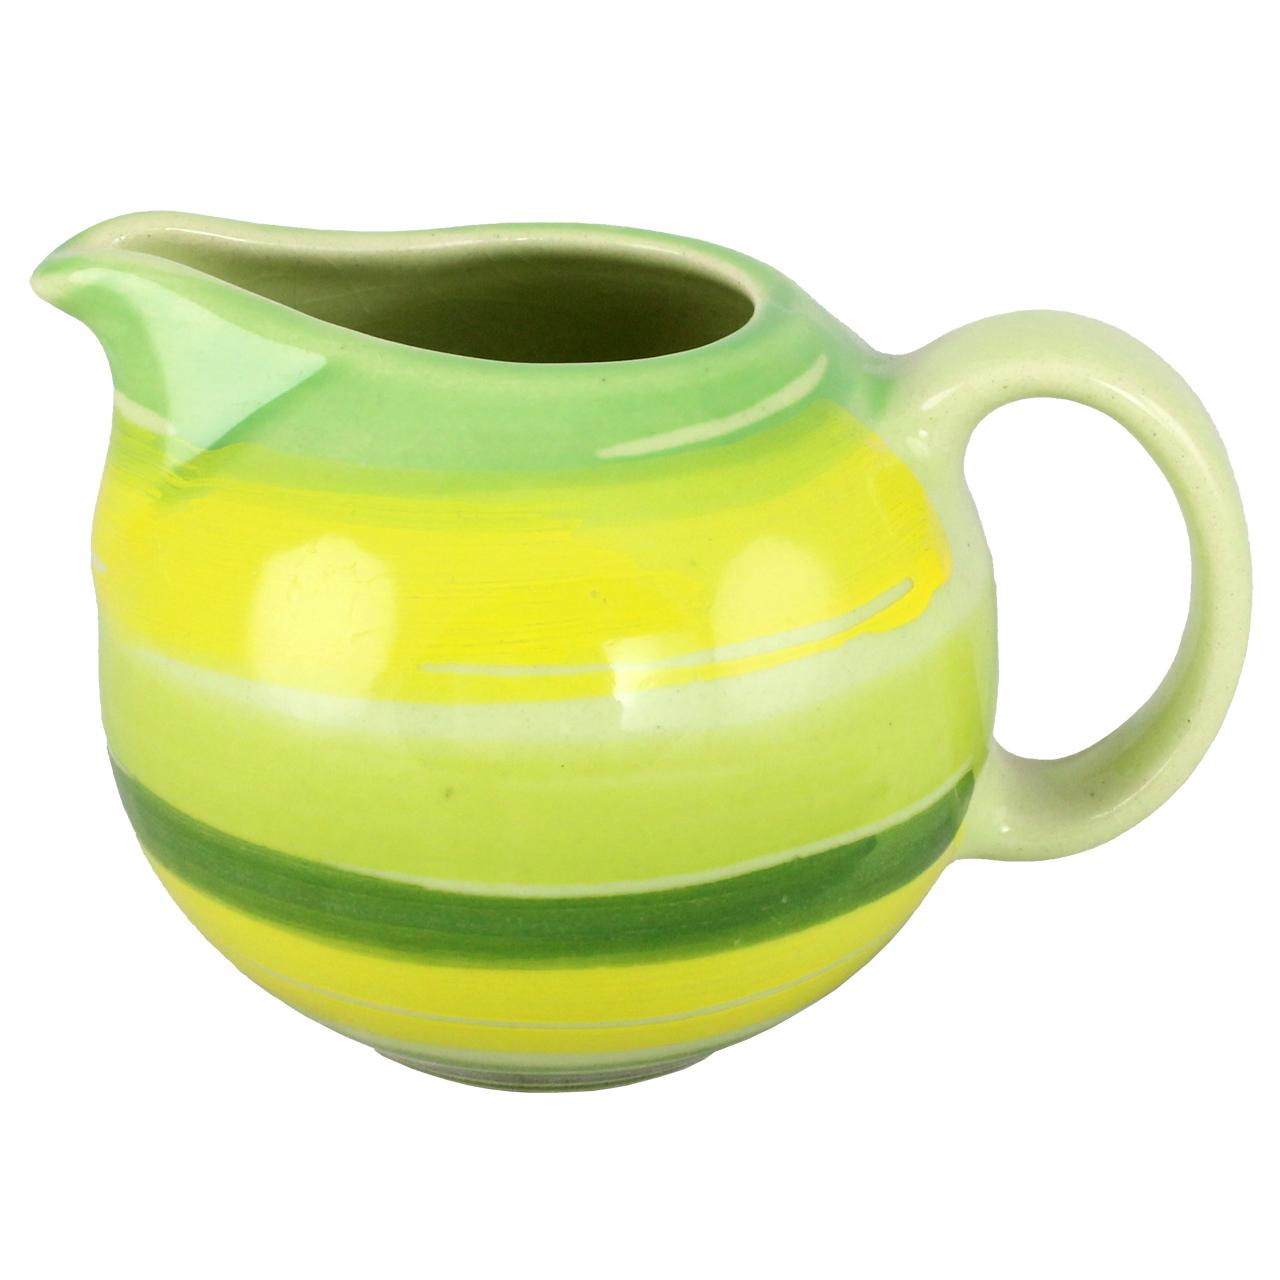 Cana Cu Cioc Din Ceramica